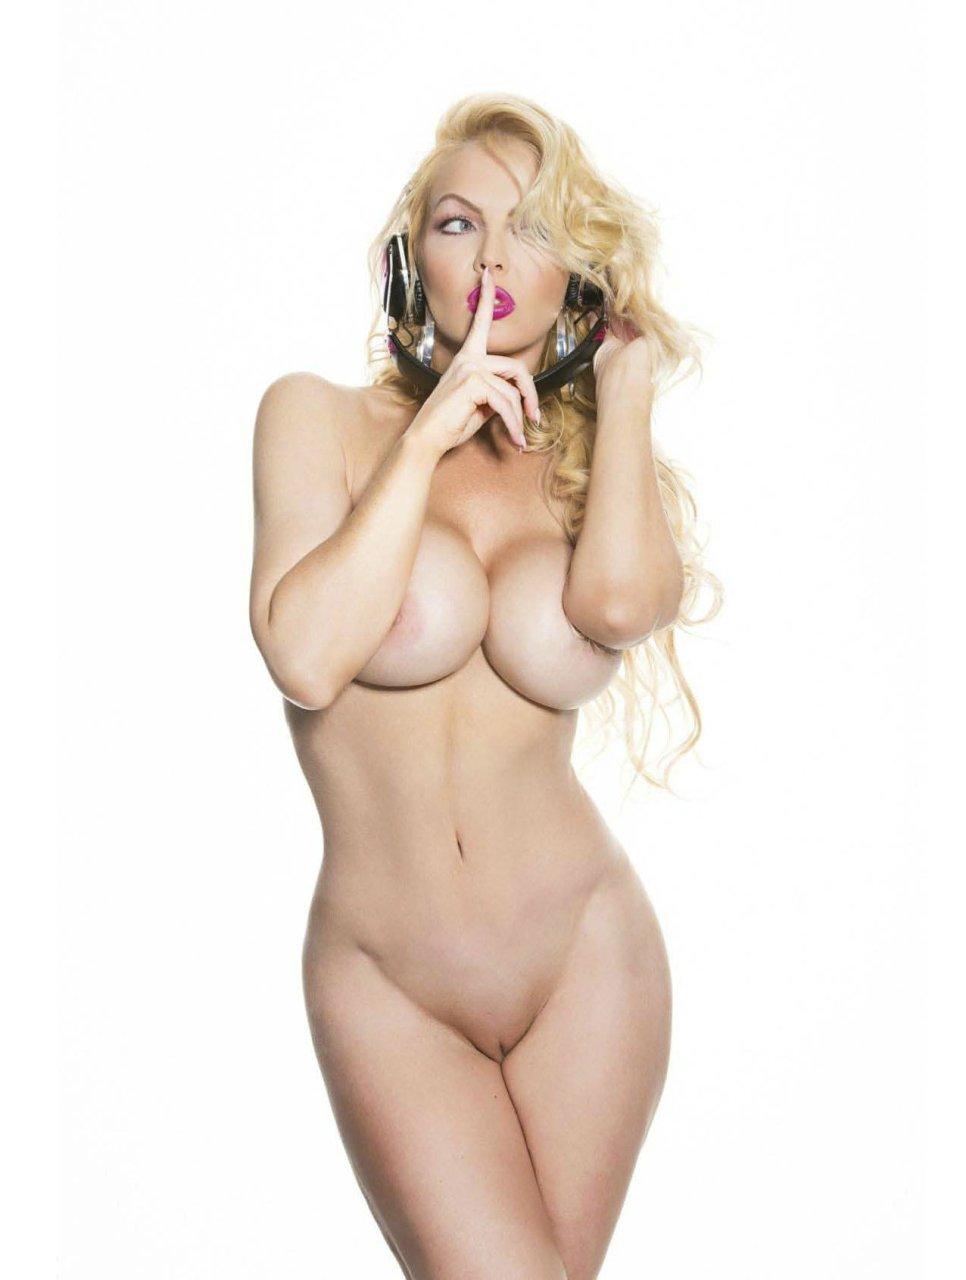 Fappening Porno Andrea Prince  naked (21 foto), Snapchat, butt